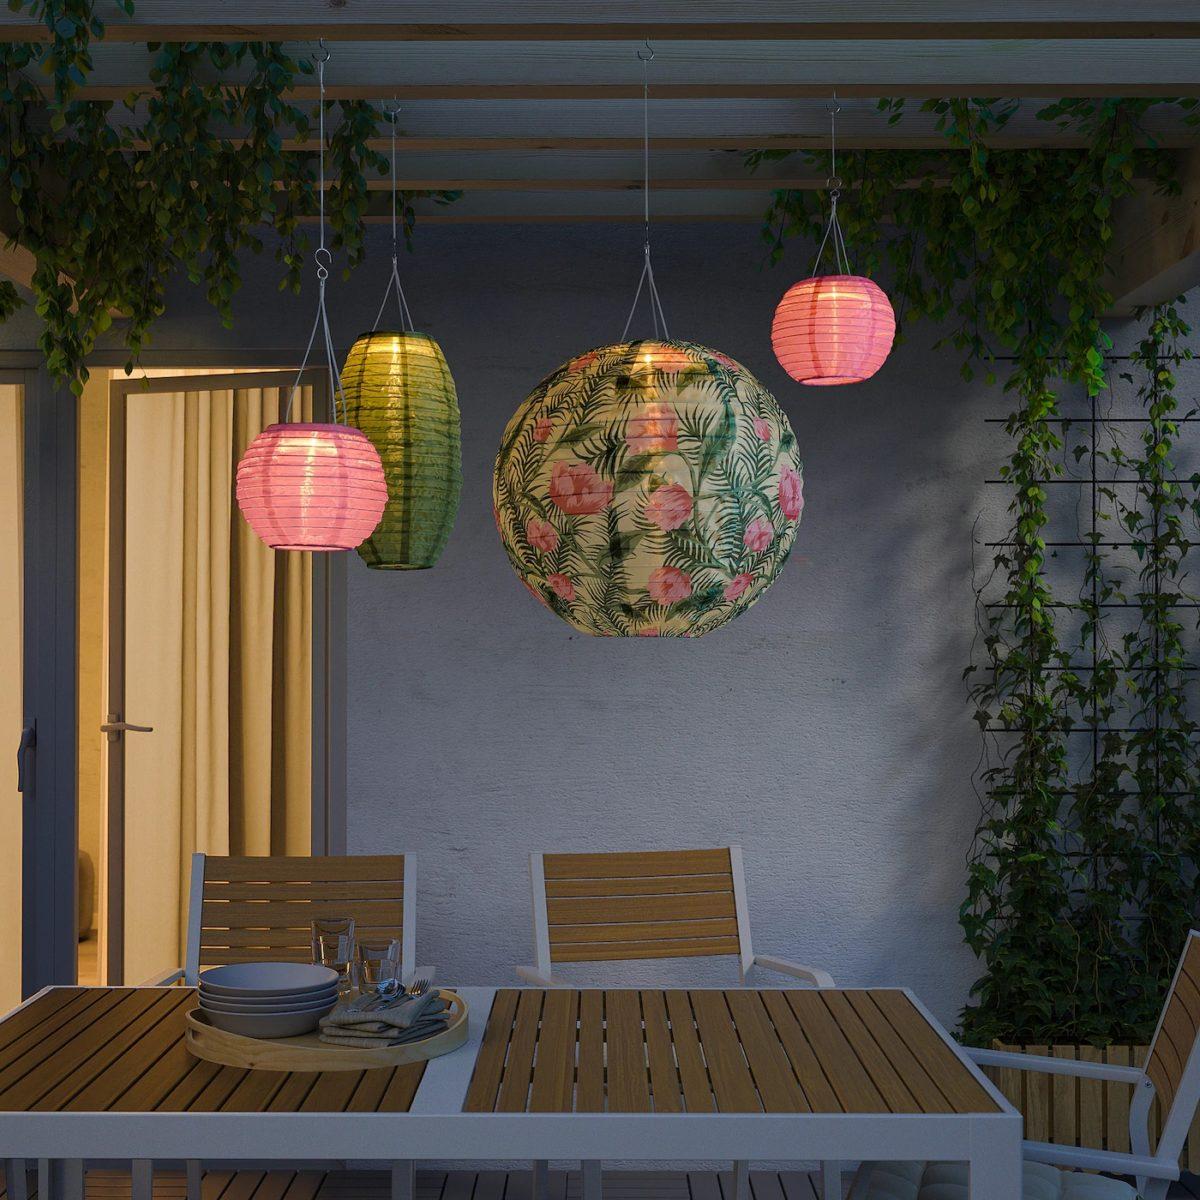 ikea-solvinden-led-solar-lmapada-balcone